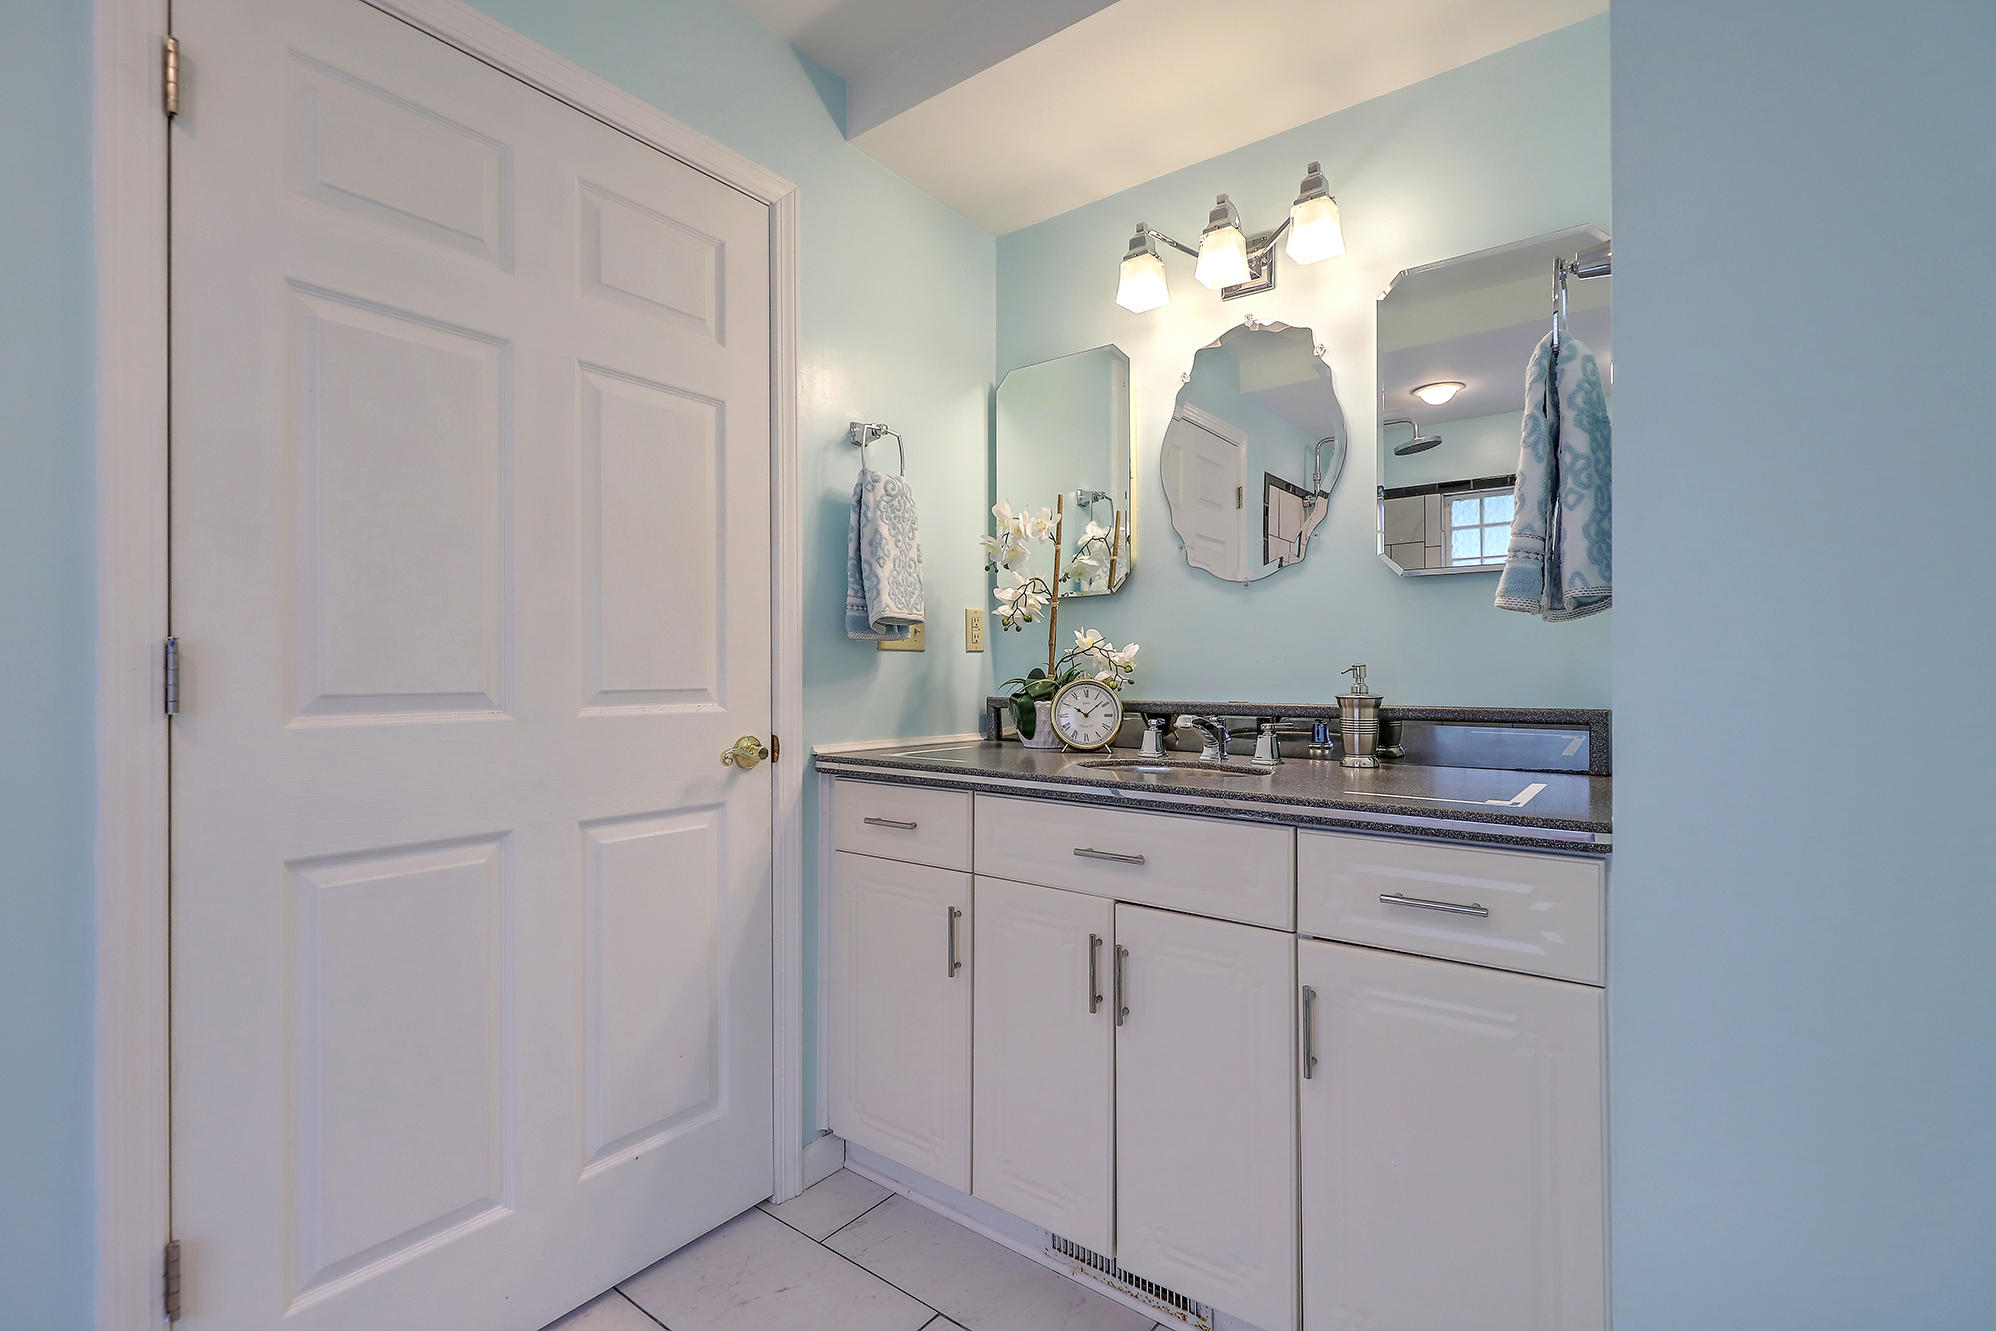 Charlestowne Estates III Homes For Sale - 1313 Coleridge, Charleston, SC - 22